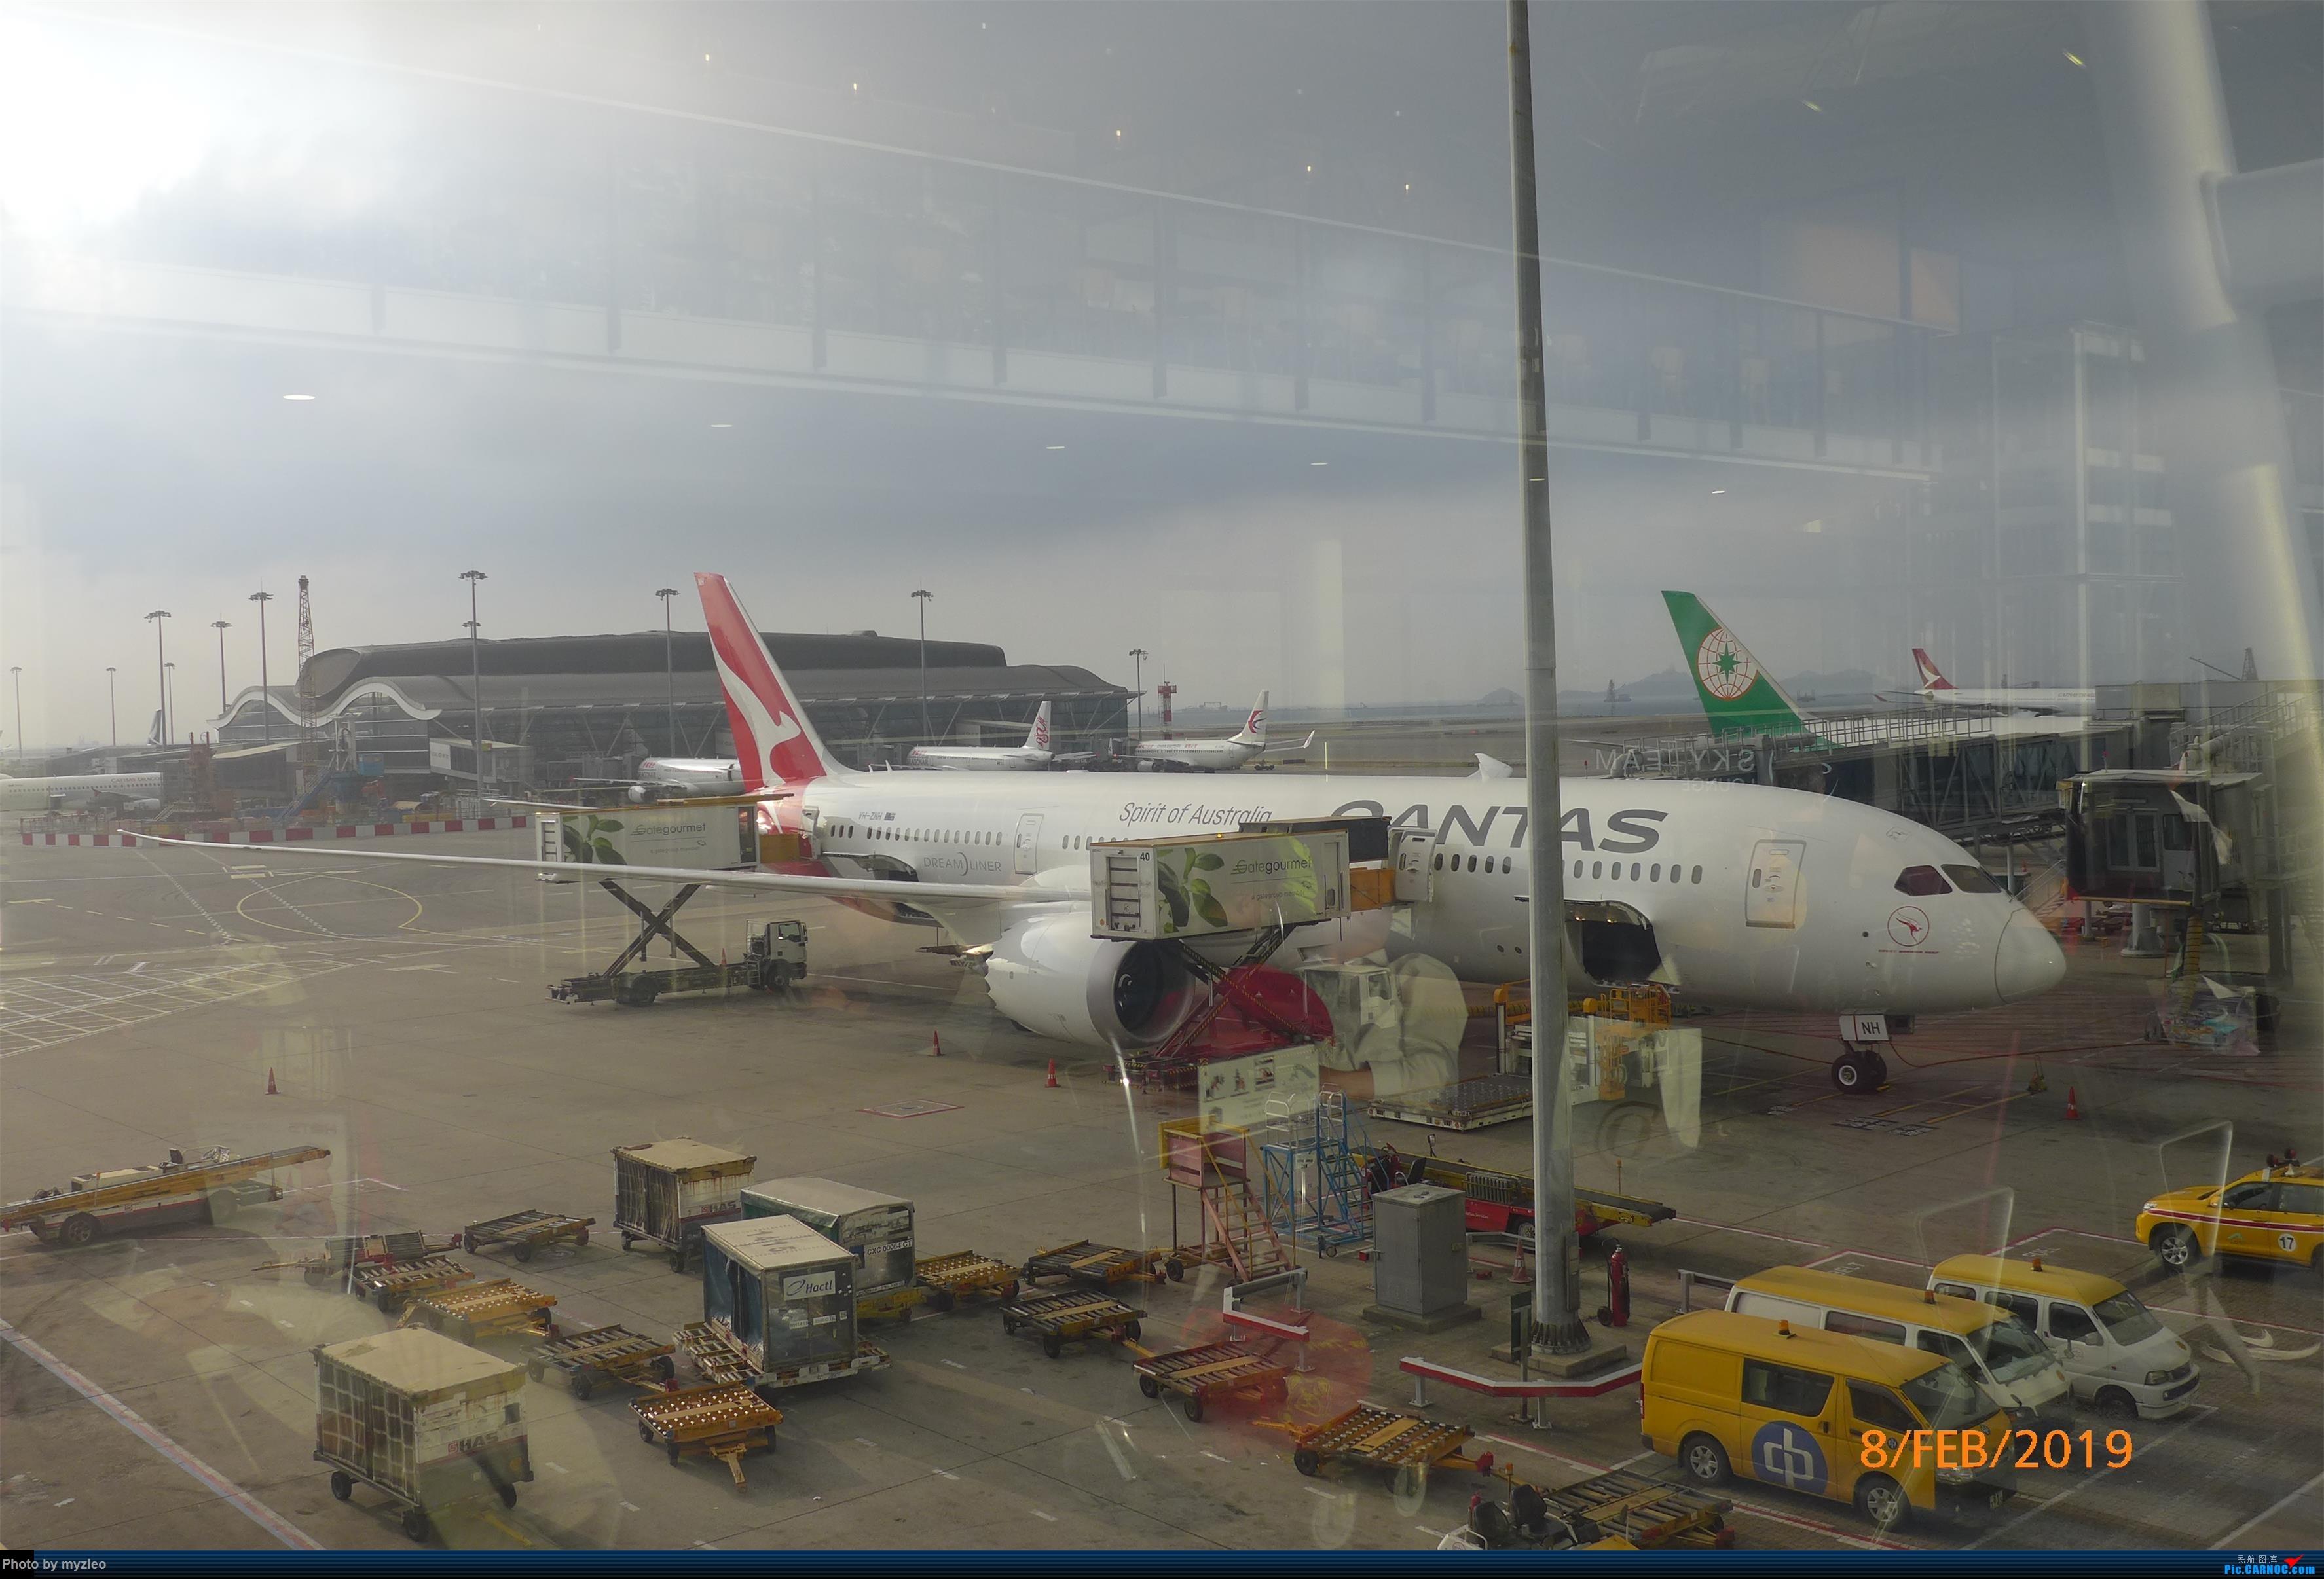 Re:[原创]【myzleo的游记4.5】十年之约(5)在香港的最后一天,搭乘港航333回沪 BOEING 787-9 VH-ZNH 中国香港国际机场